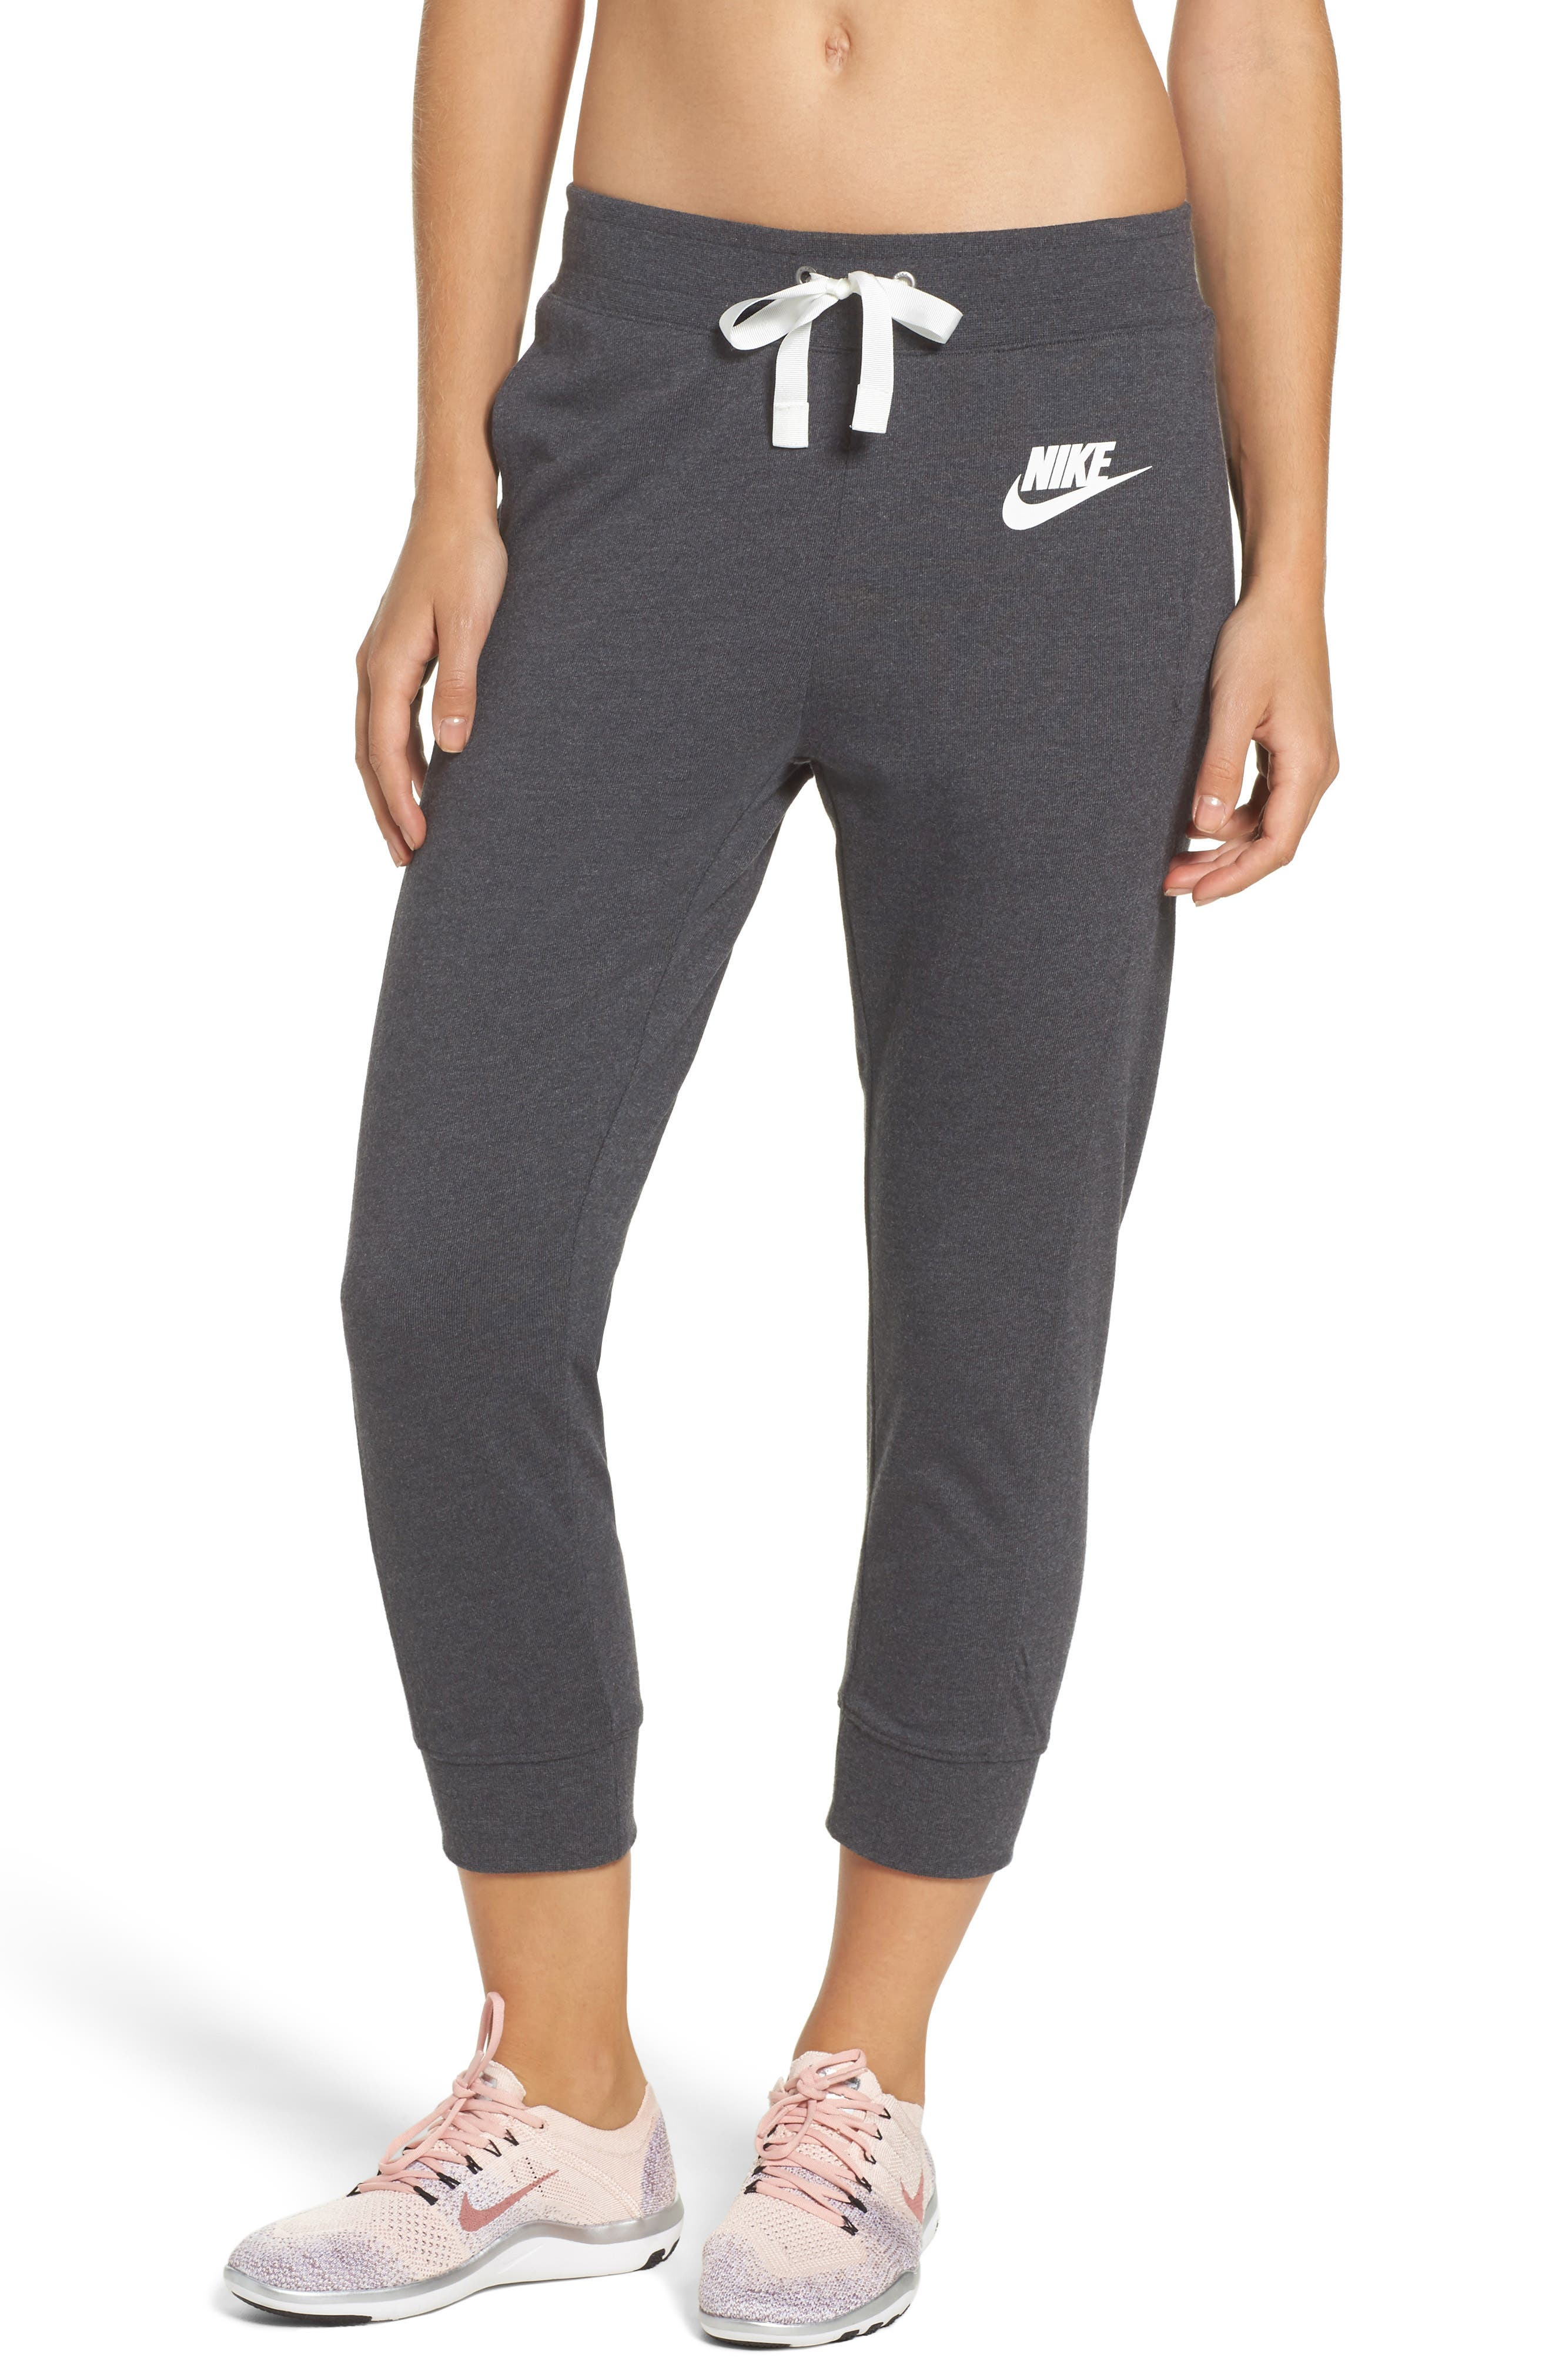 Sportswear Gym Capris,                             Main thumbnail 1, color,                             Black Heather/ Sail